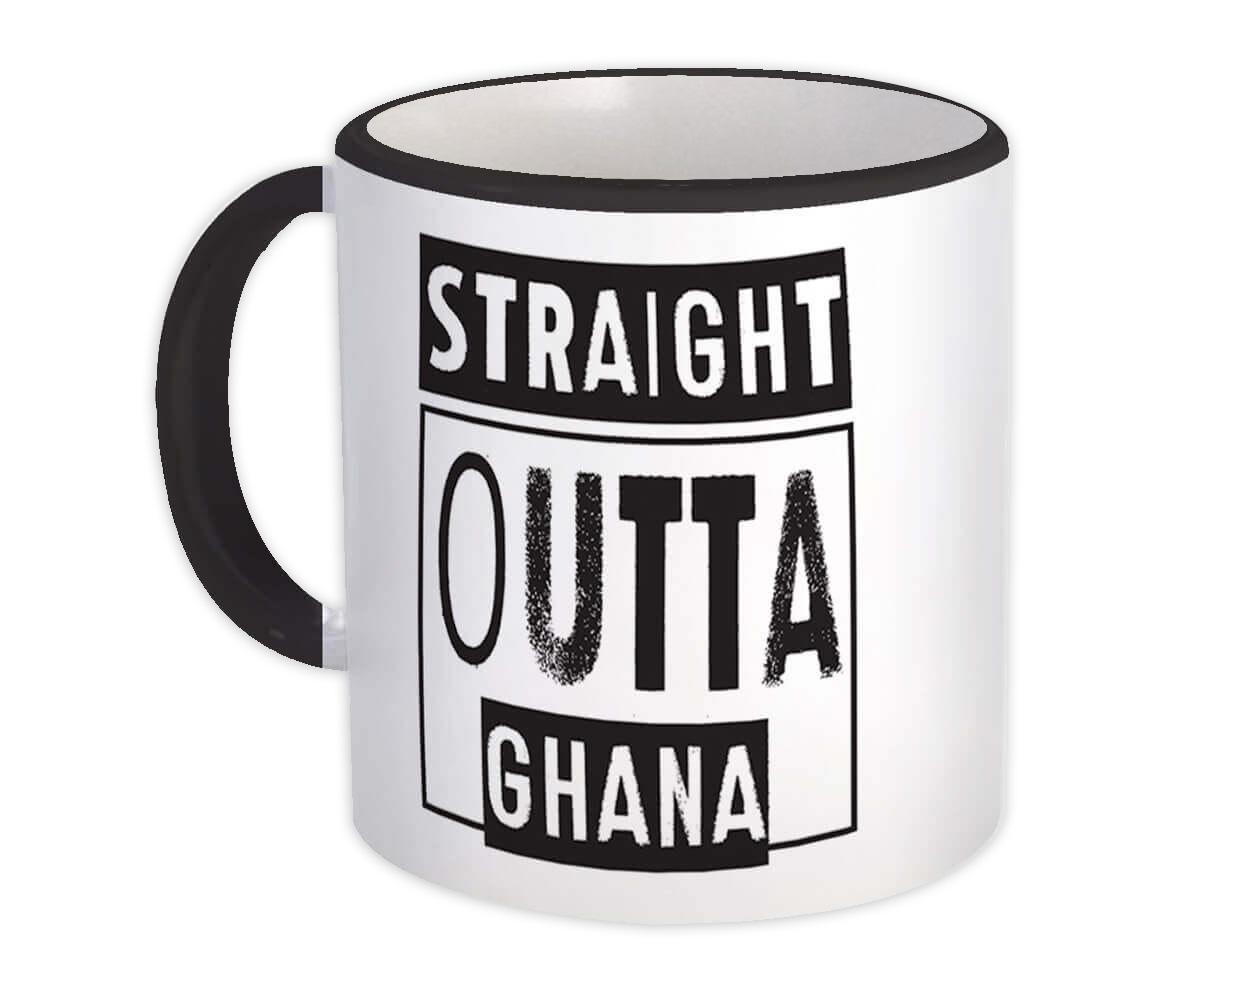 Straight Outta Ghana : Gift Mug Expat Country Ghanaian